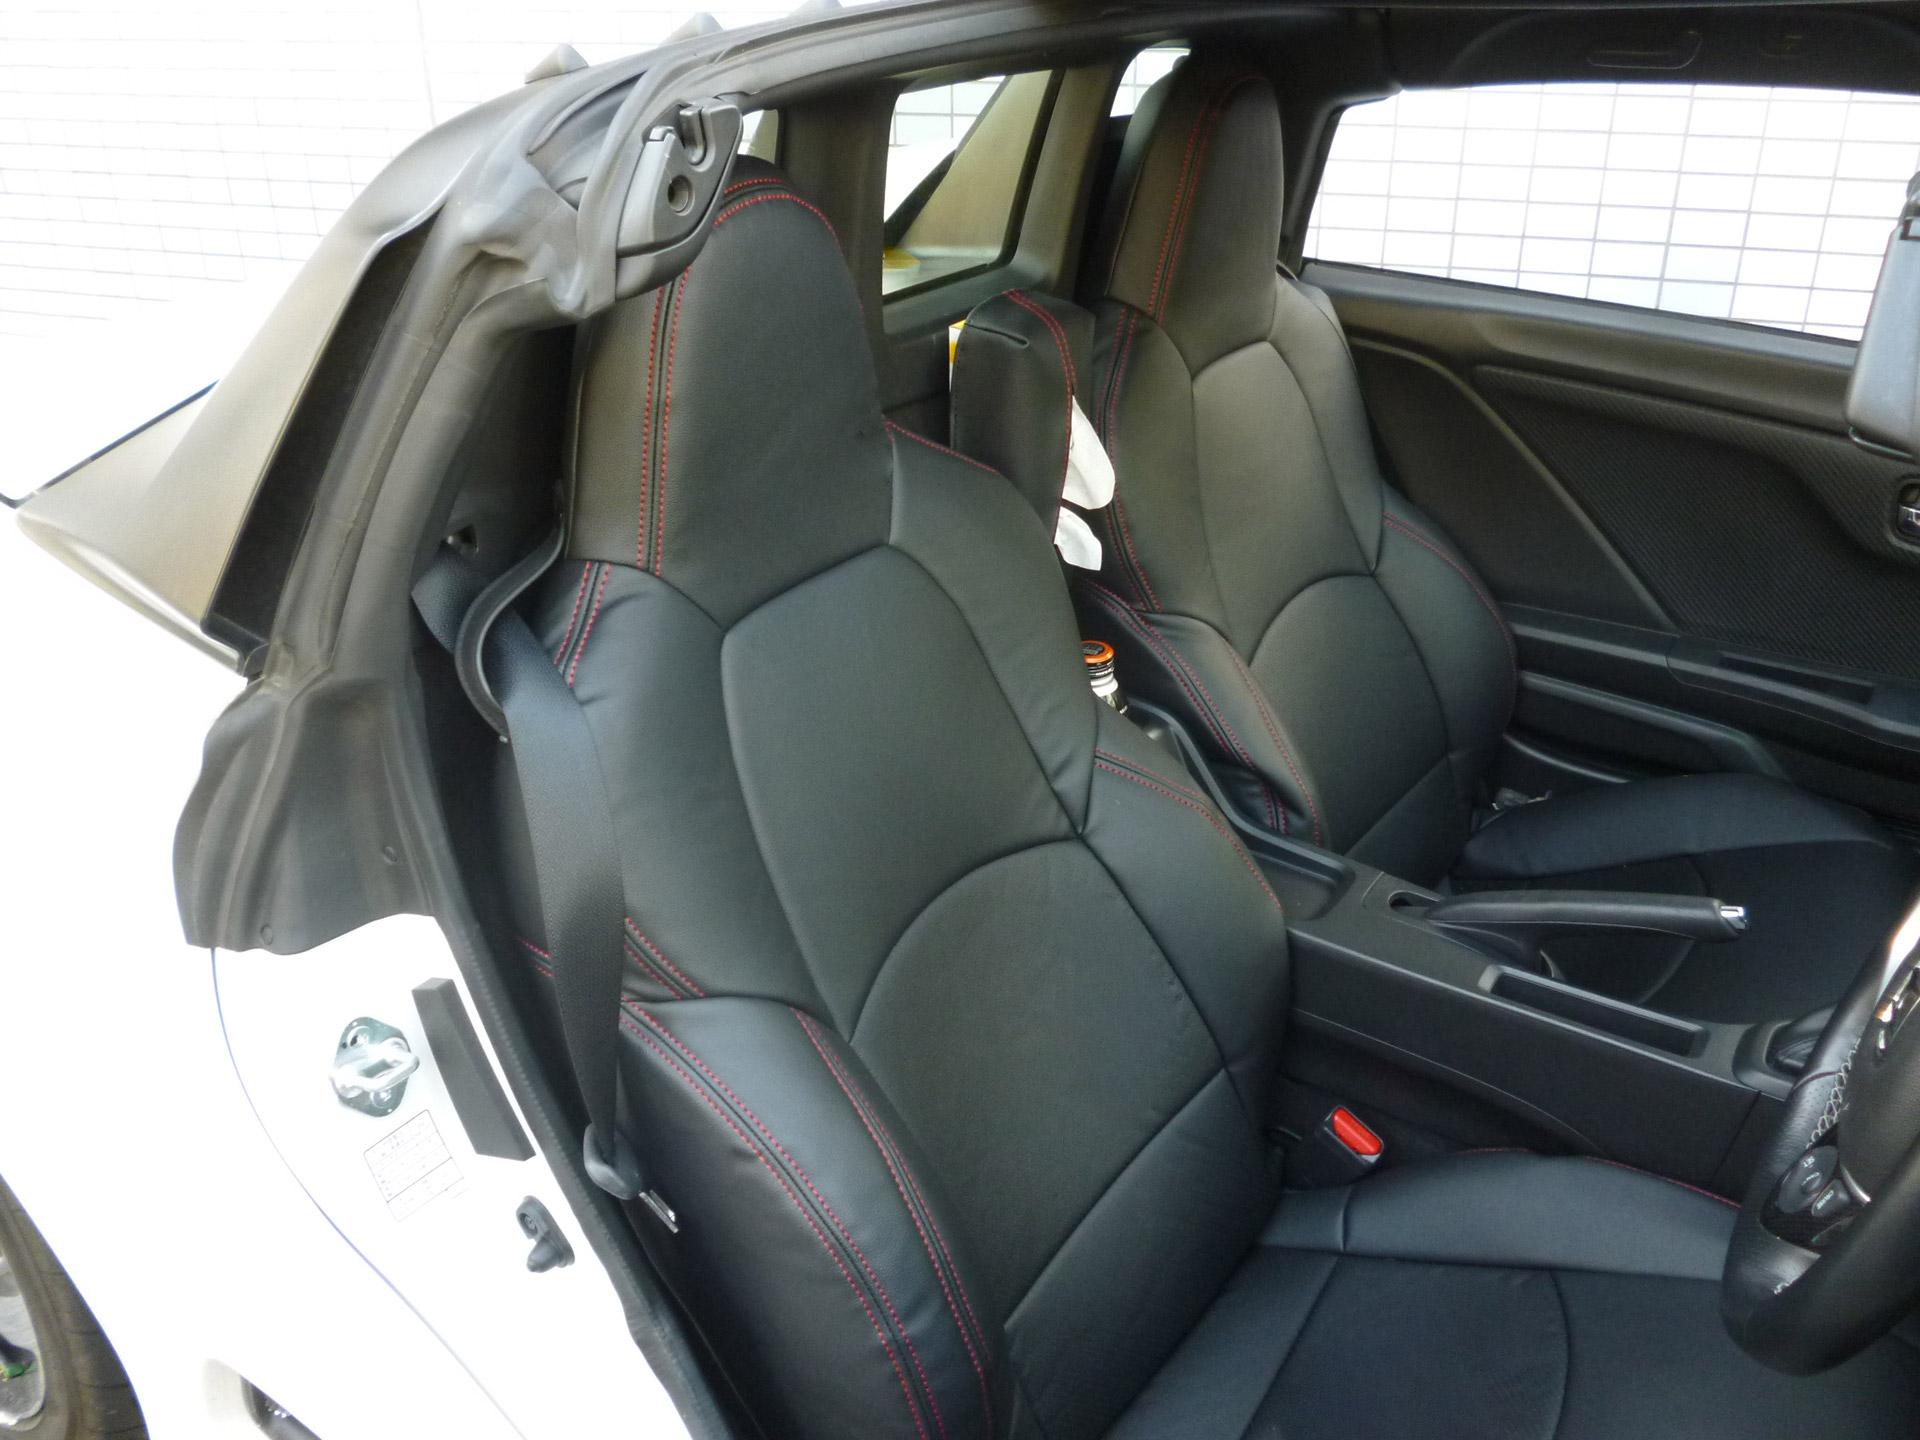 Refinad Leather SeriesホンダS660